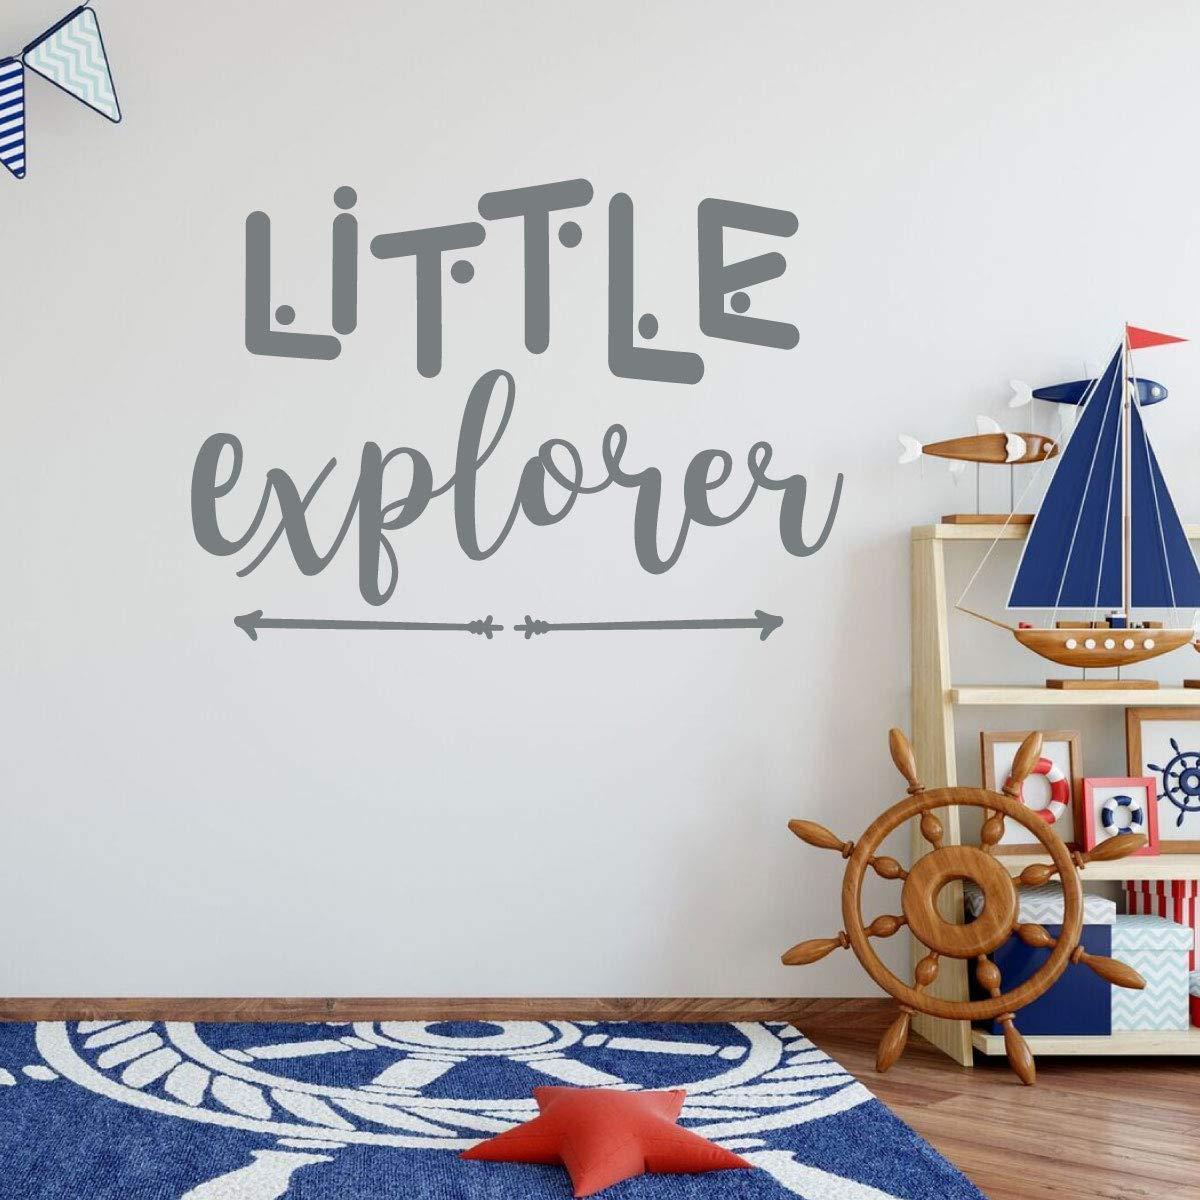 Amazon Com Children S Room Wall Decal Little Explorer With Arrow Design Boys Or Girl S Bedroom Decoration Playroom Or Nursery Room Decor Handmade